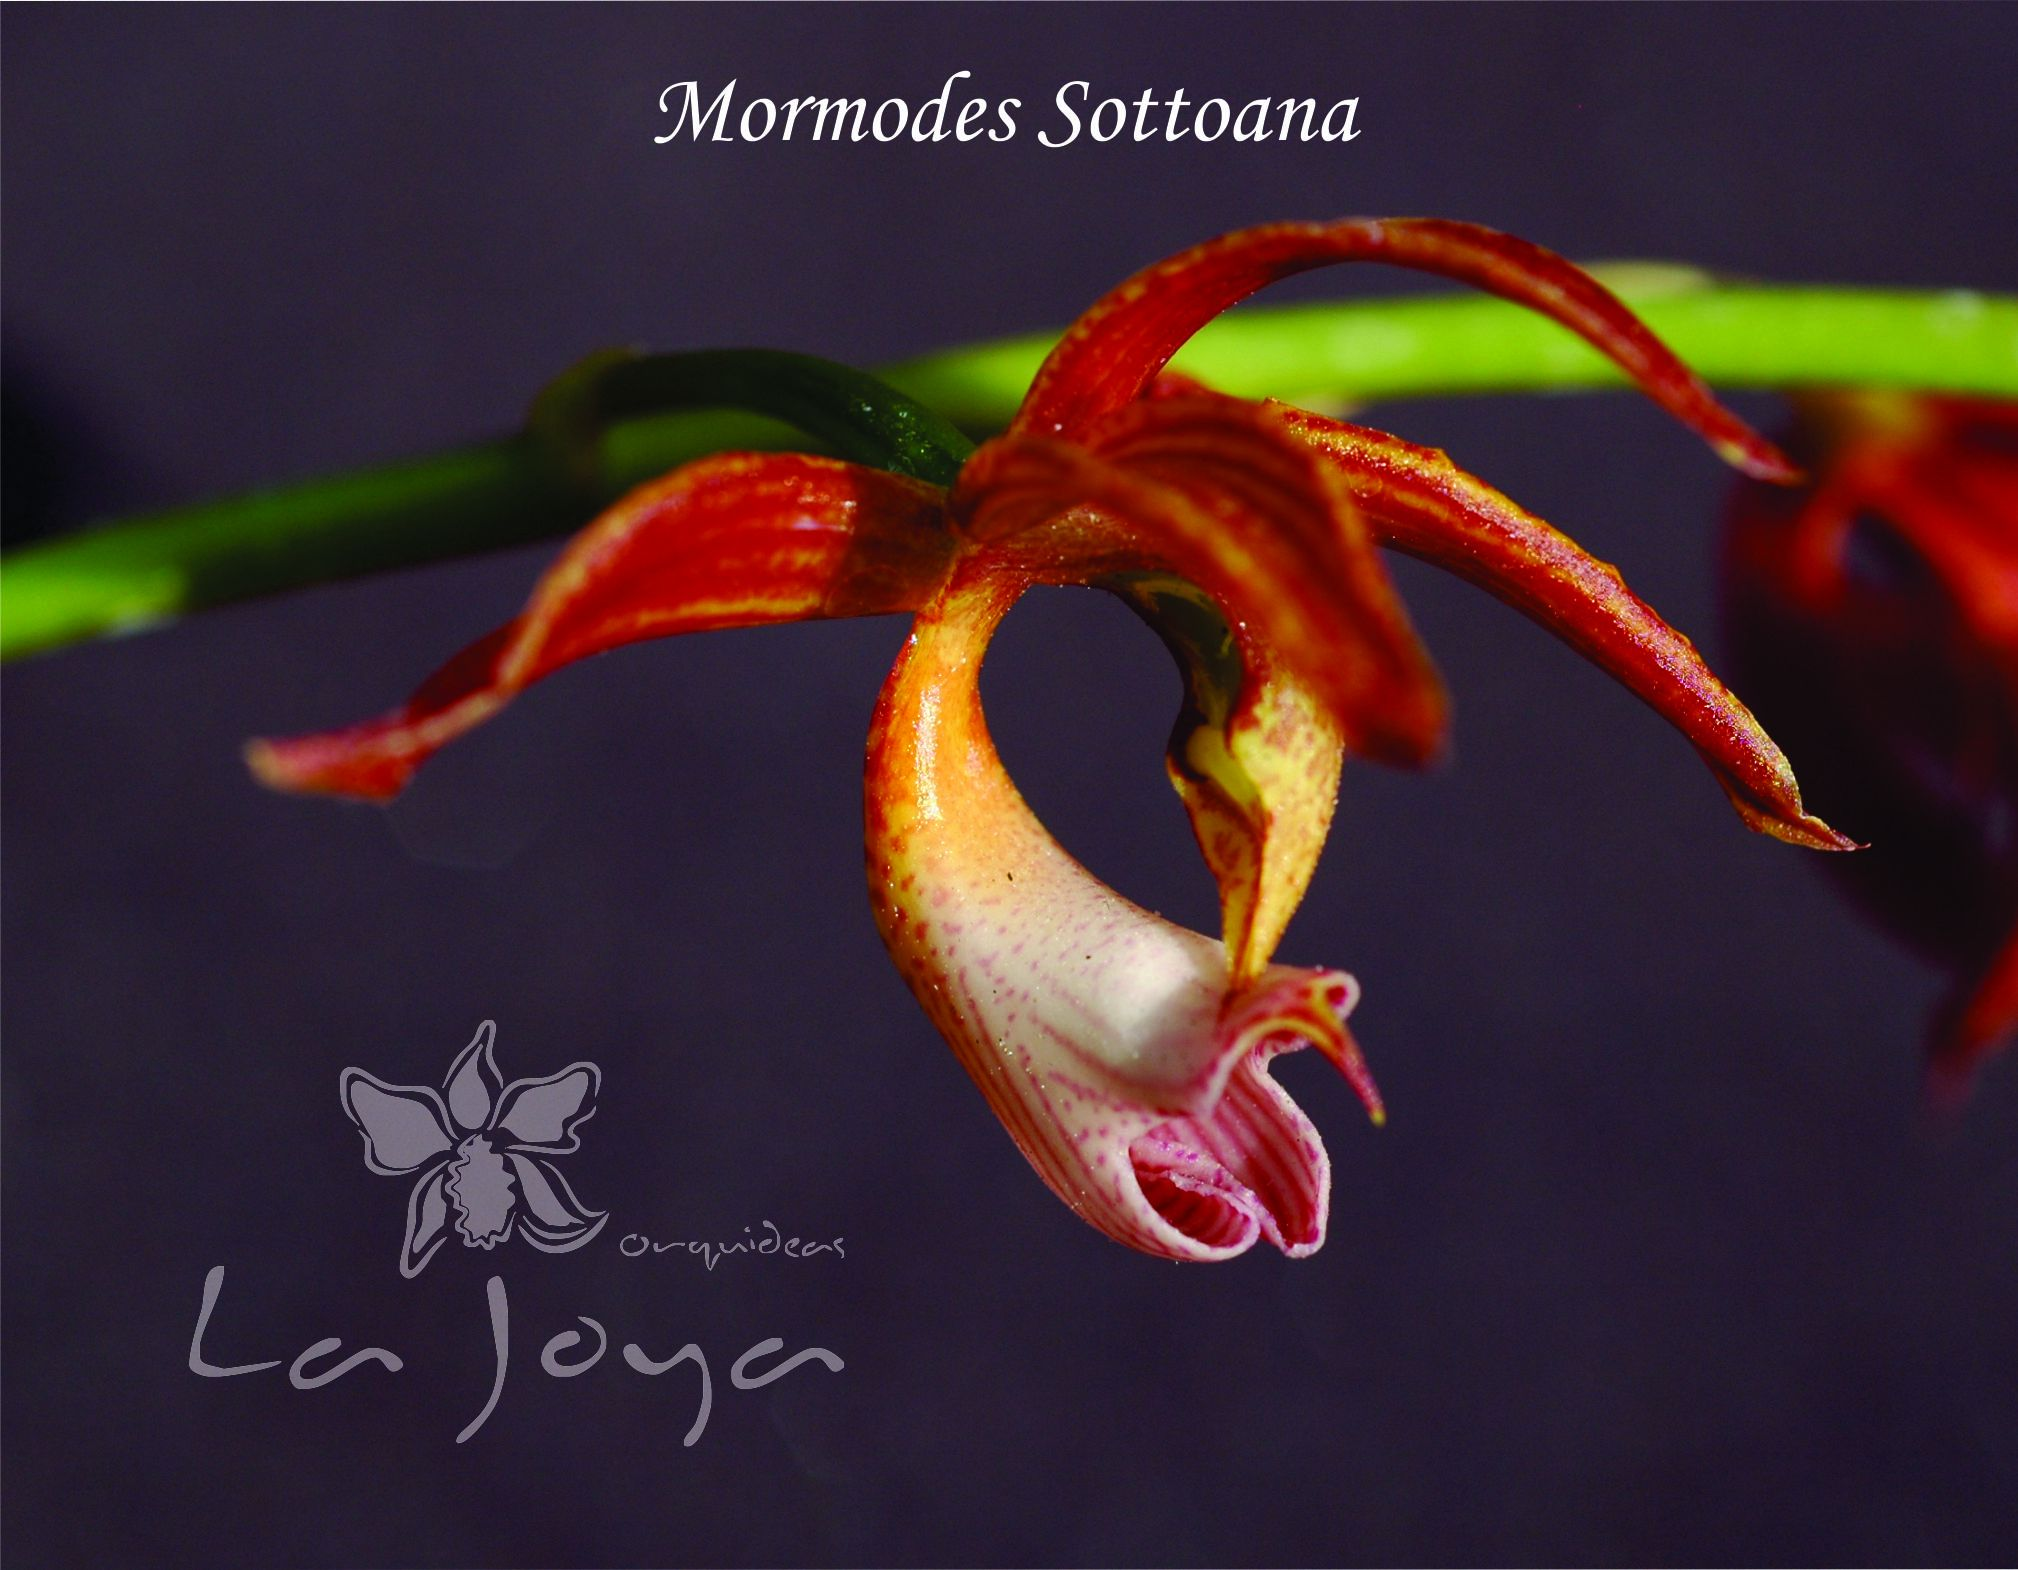 Mormodes Sottoana